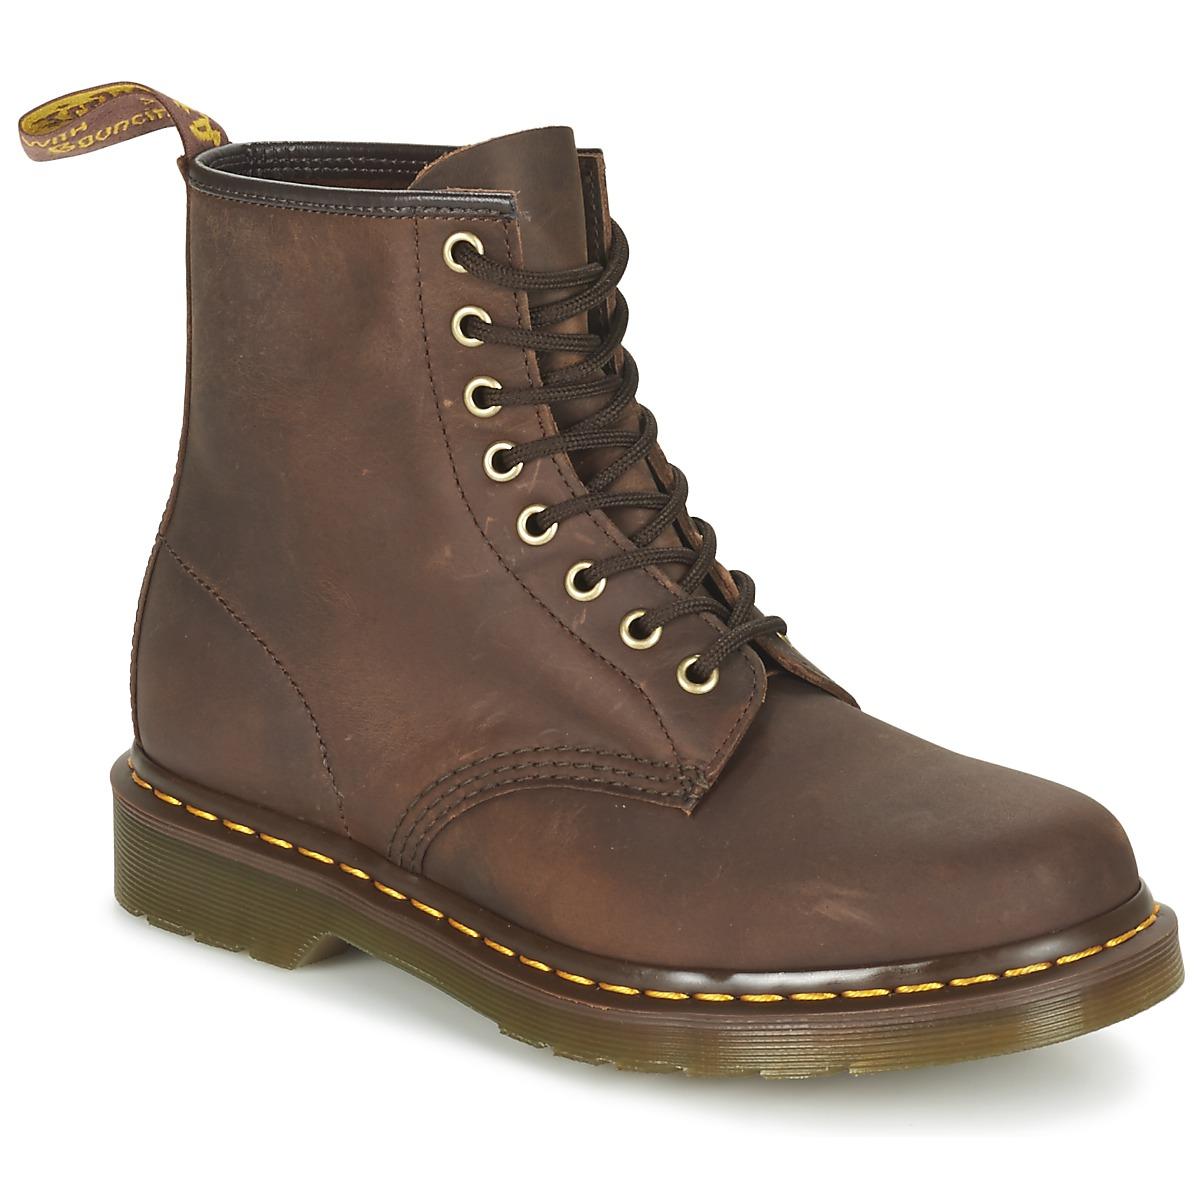 fb4e6249079 Botines   Low boots hombre - Gran selección de Botines   Low boots ...